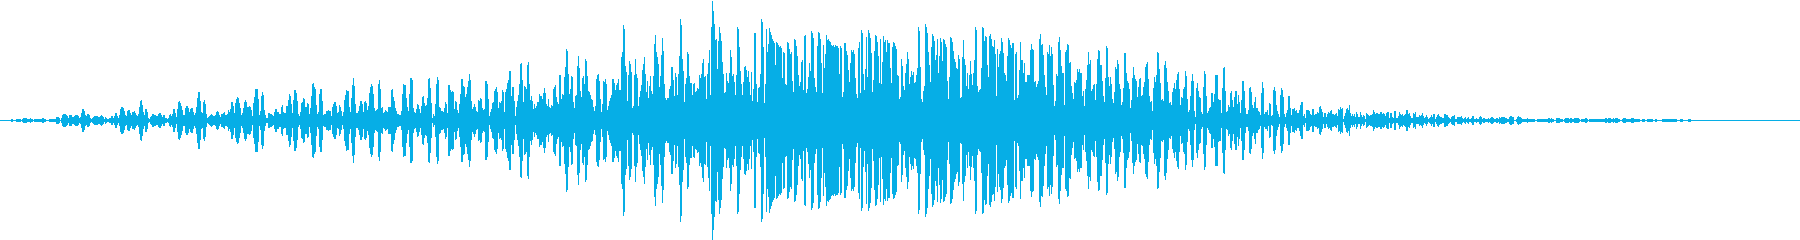 SF通過音02-03の再生済みの波形